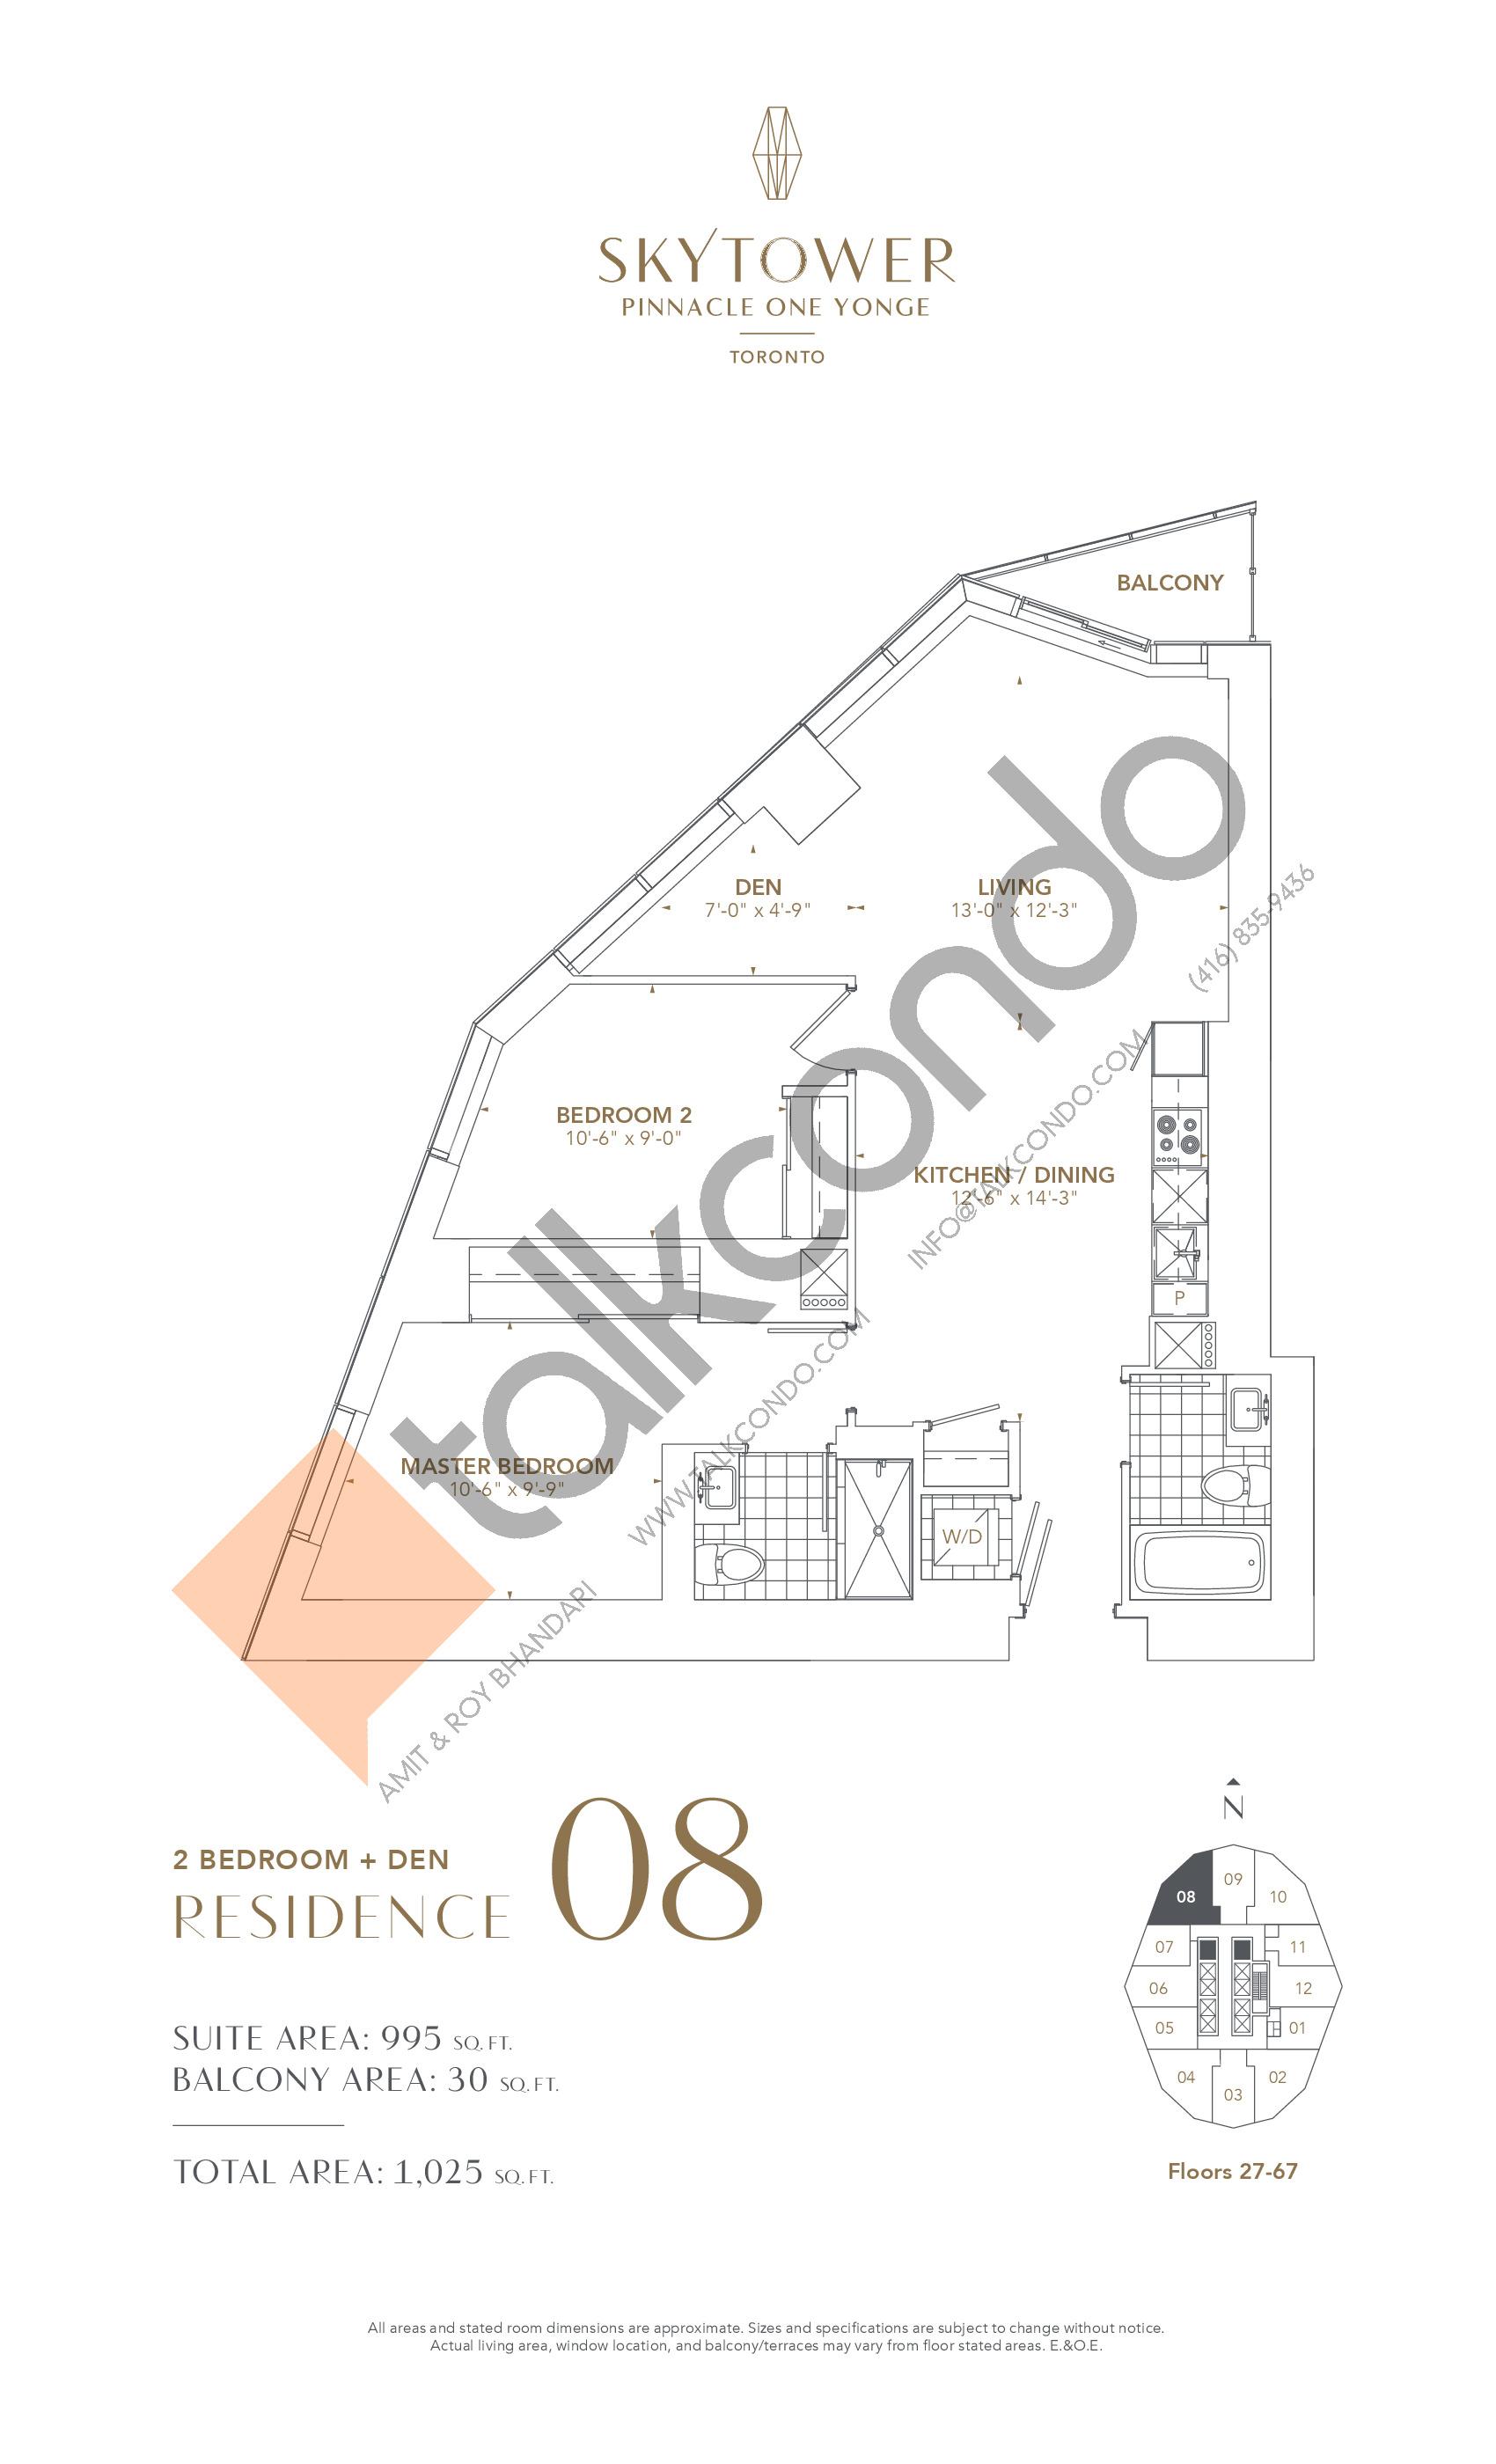 Residence 08 Floor Plan at SkyTower at Pinnacle One Yonge - 995 sq.ft